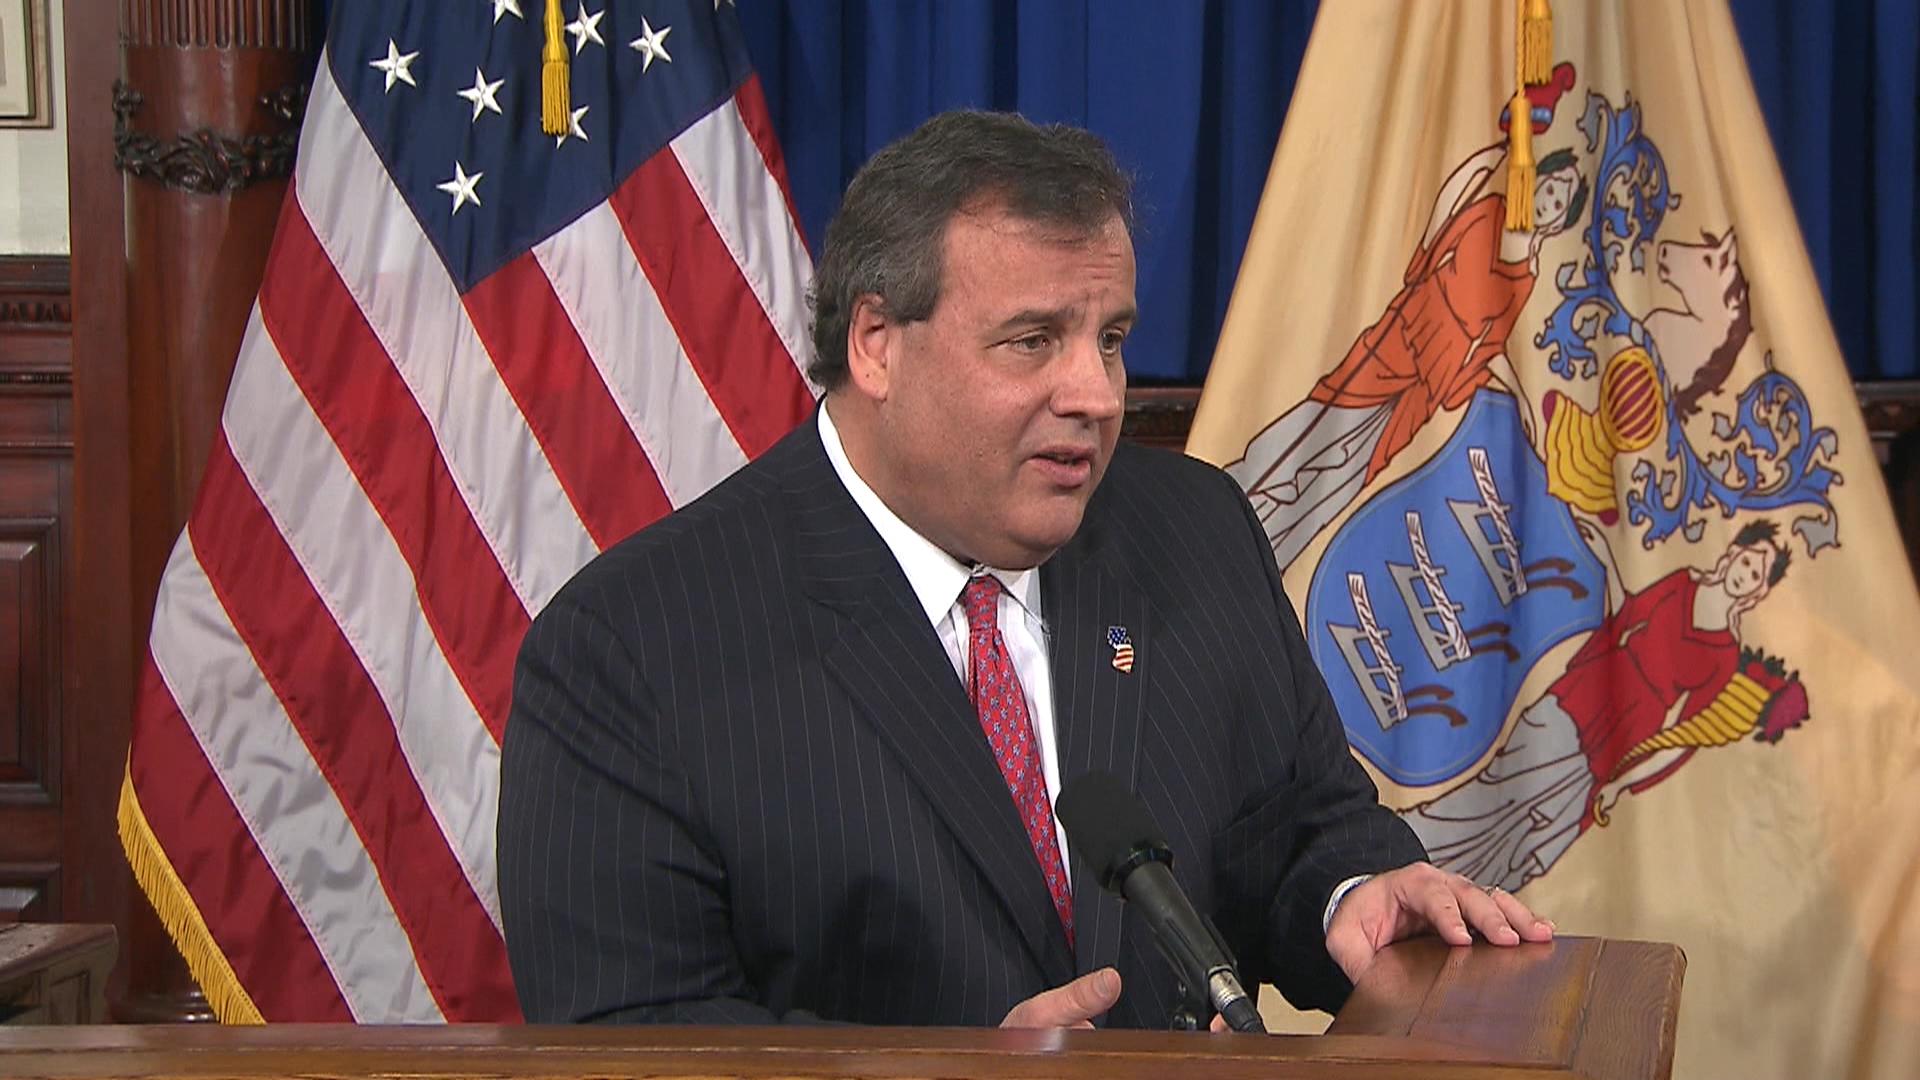 Former NJ gov.: Christie handled himself well